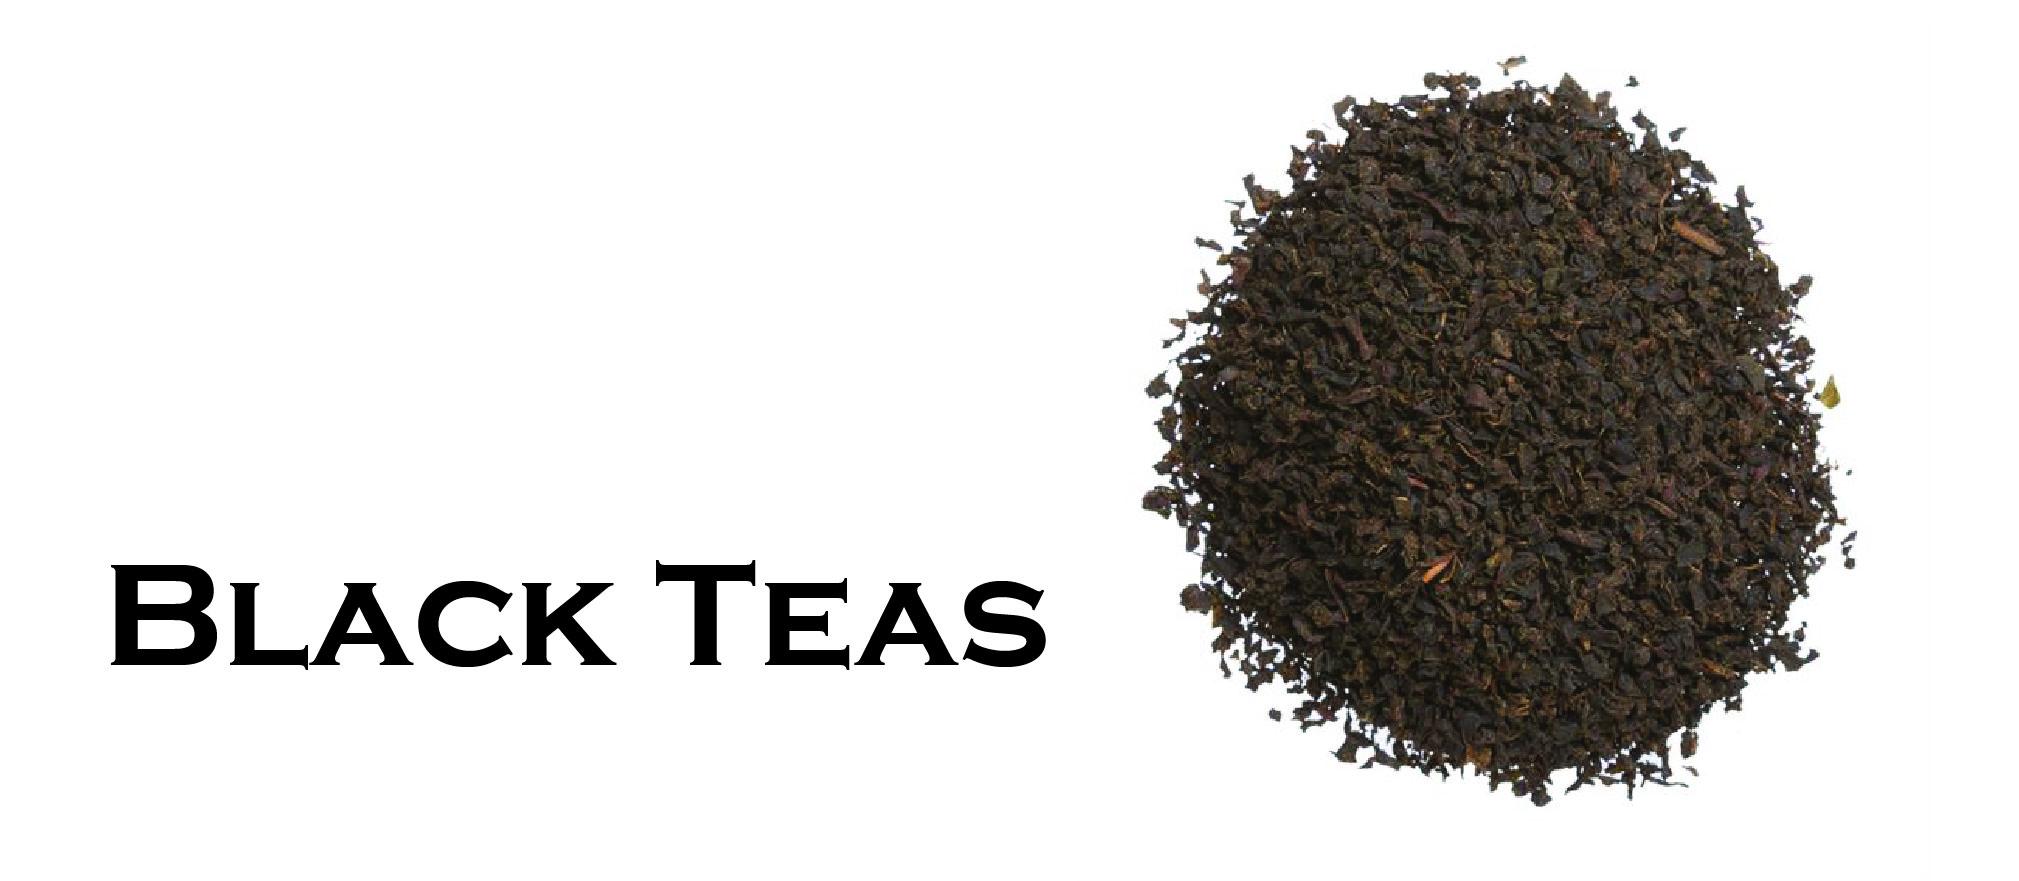 Cuban Brothers Premium Black Tea